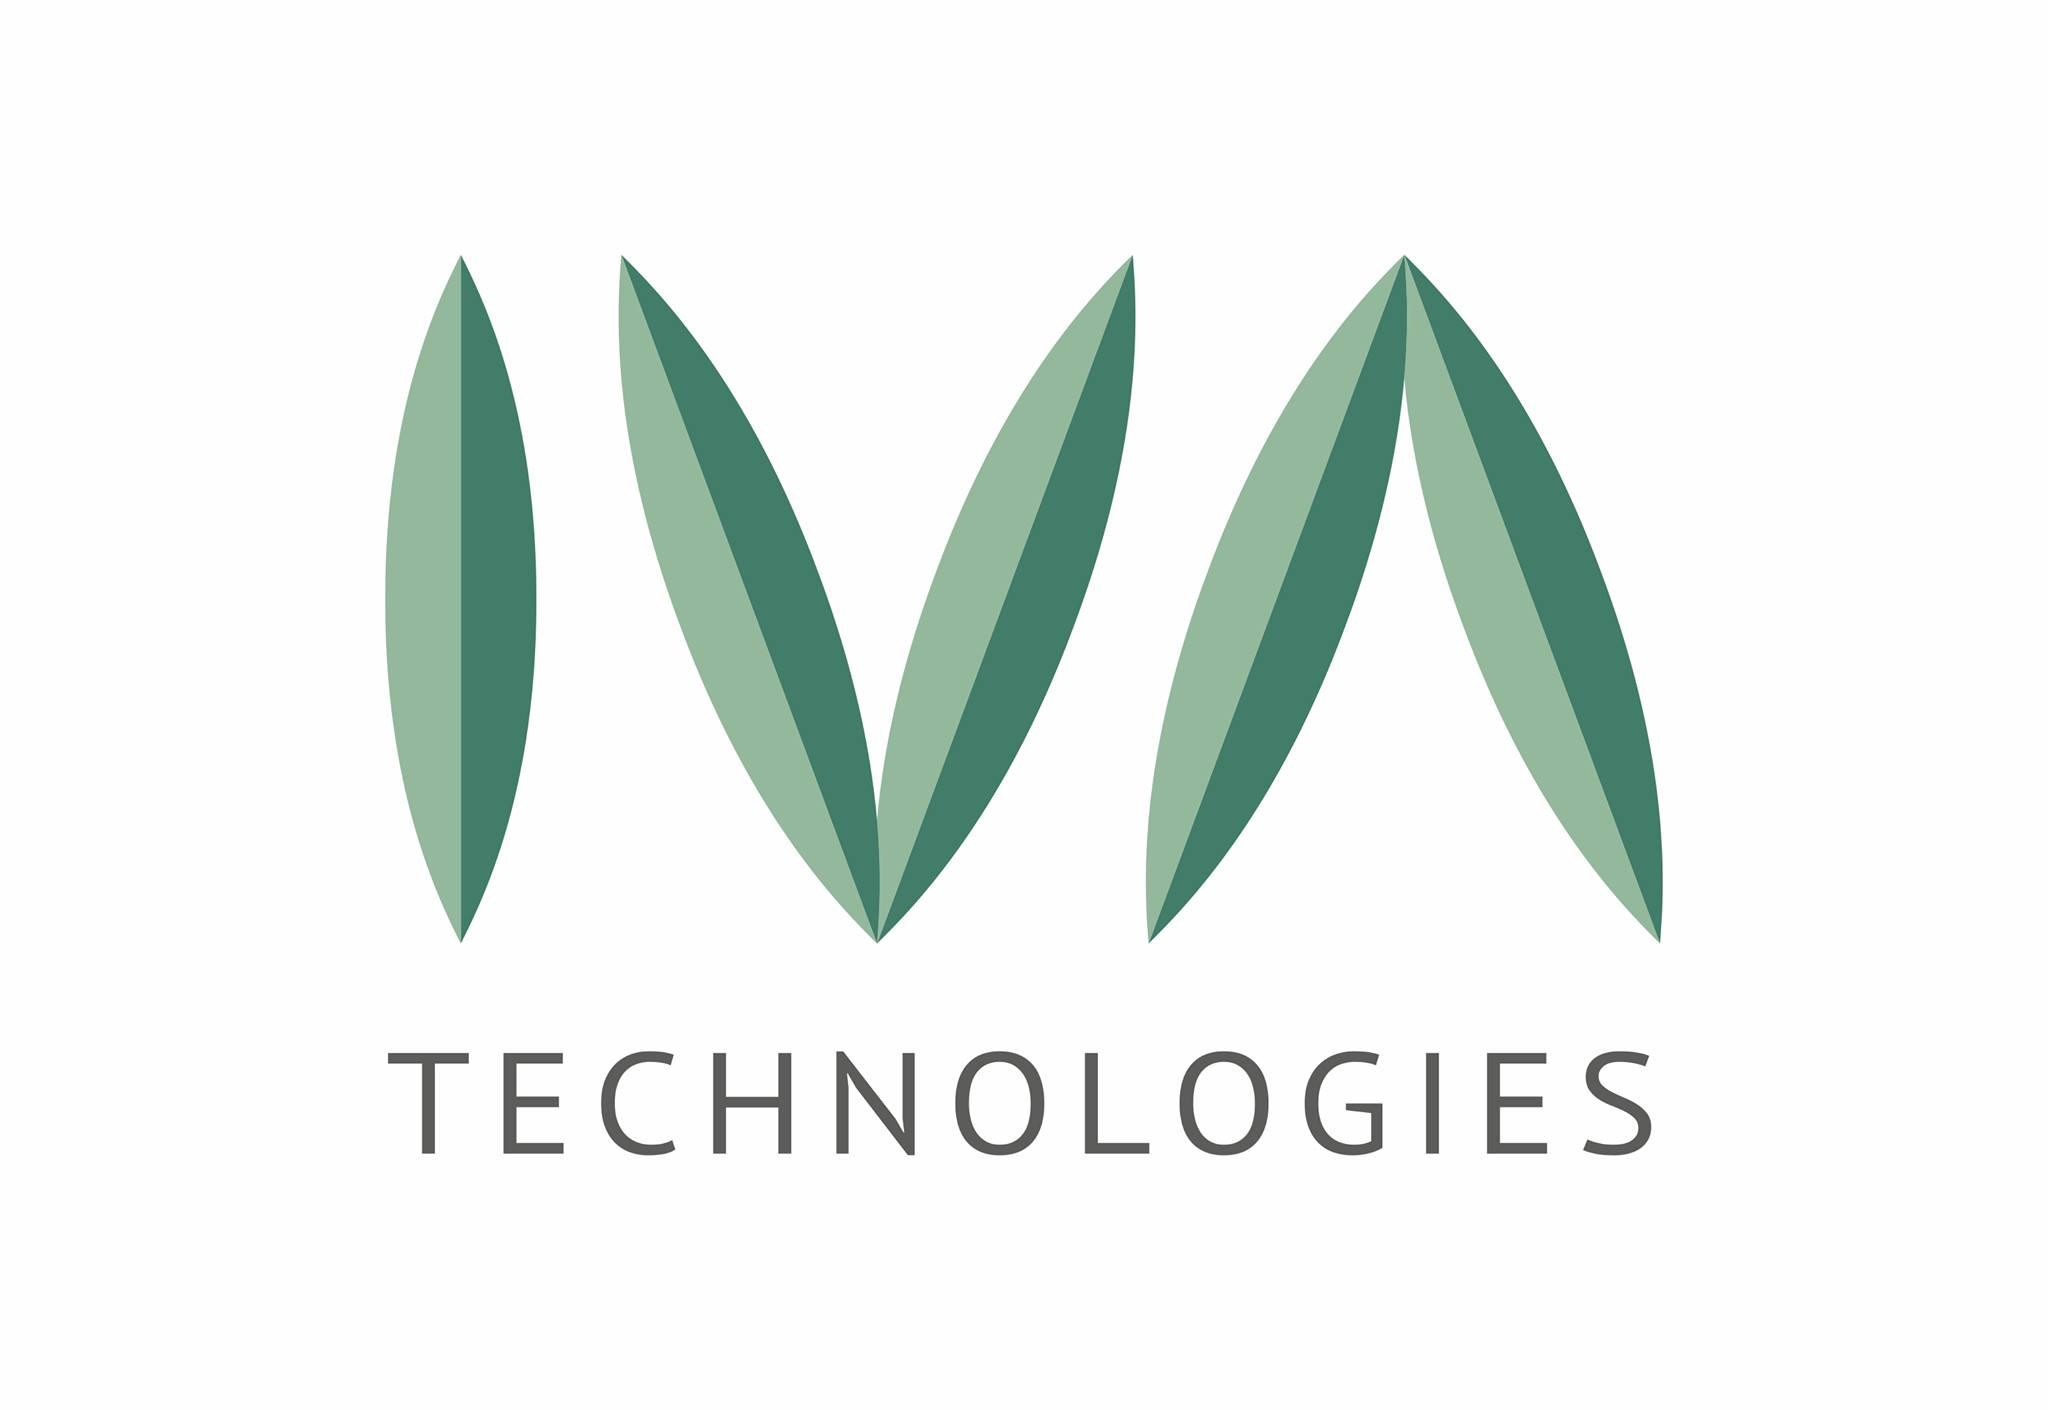 IVA Cognitive Video (IVA CV)